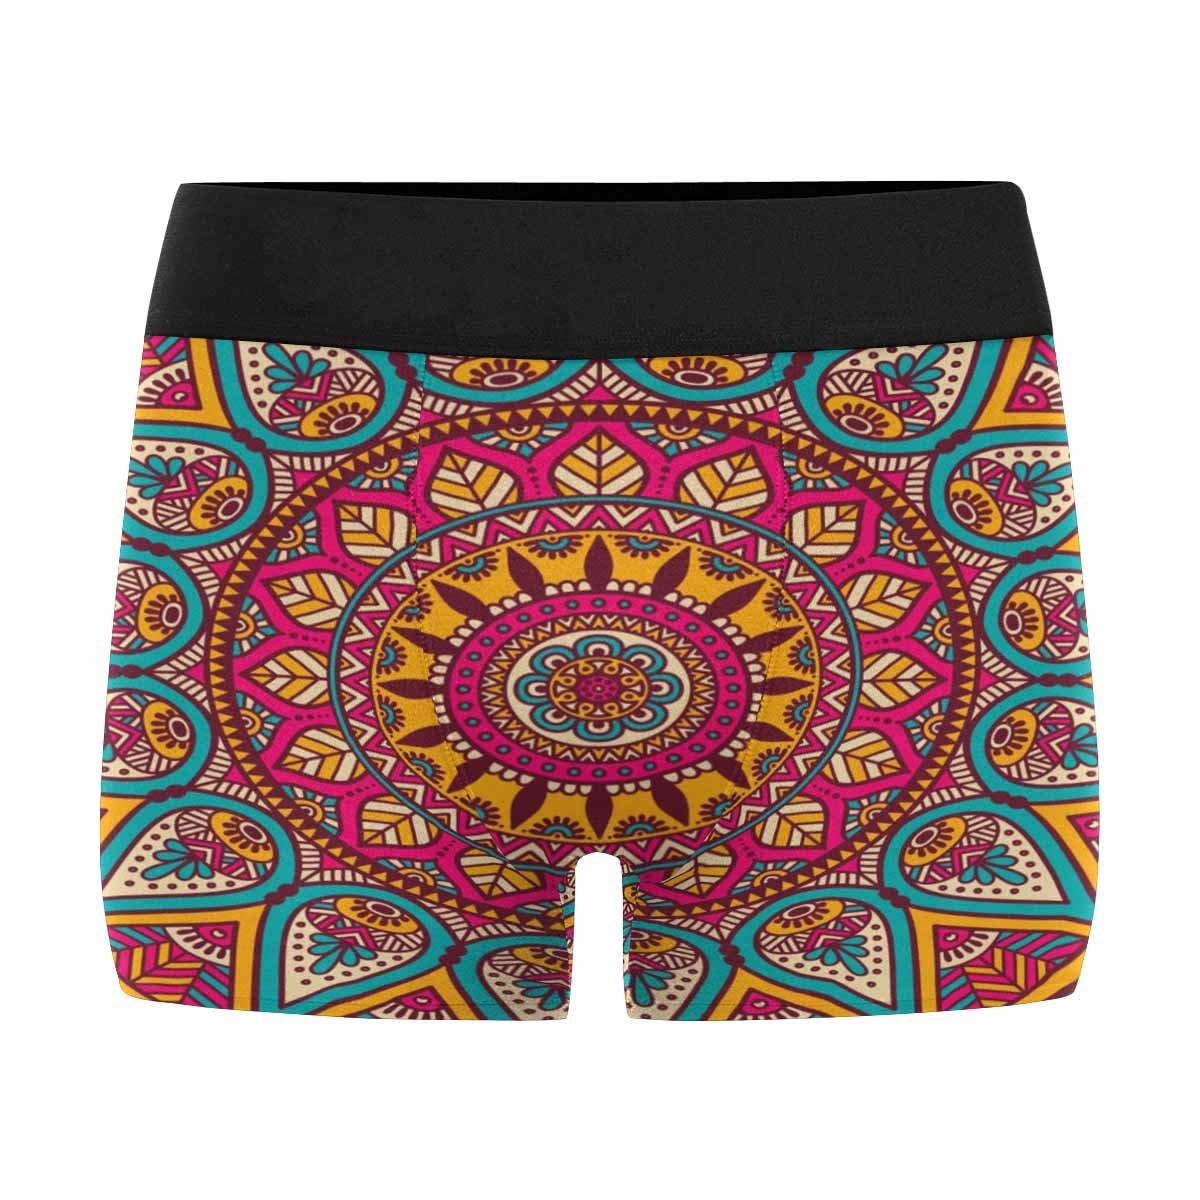 INTERESTPRINT Boxer Briefs Mens Underwear Mandala Vintage Decorative Arabic Indian XXL